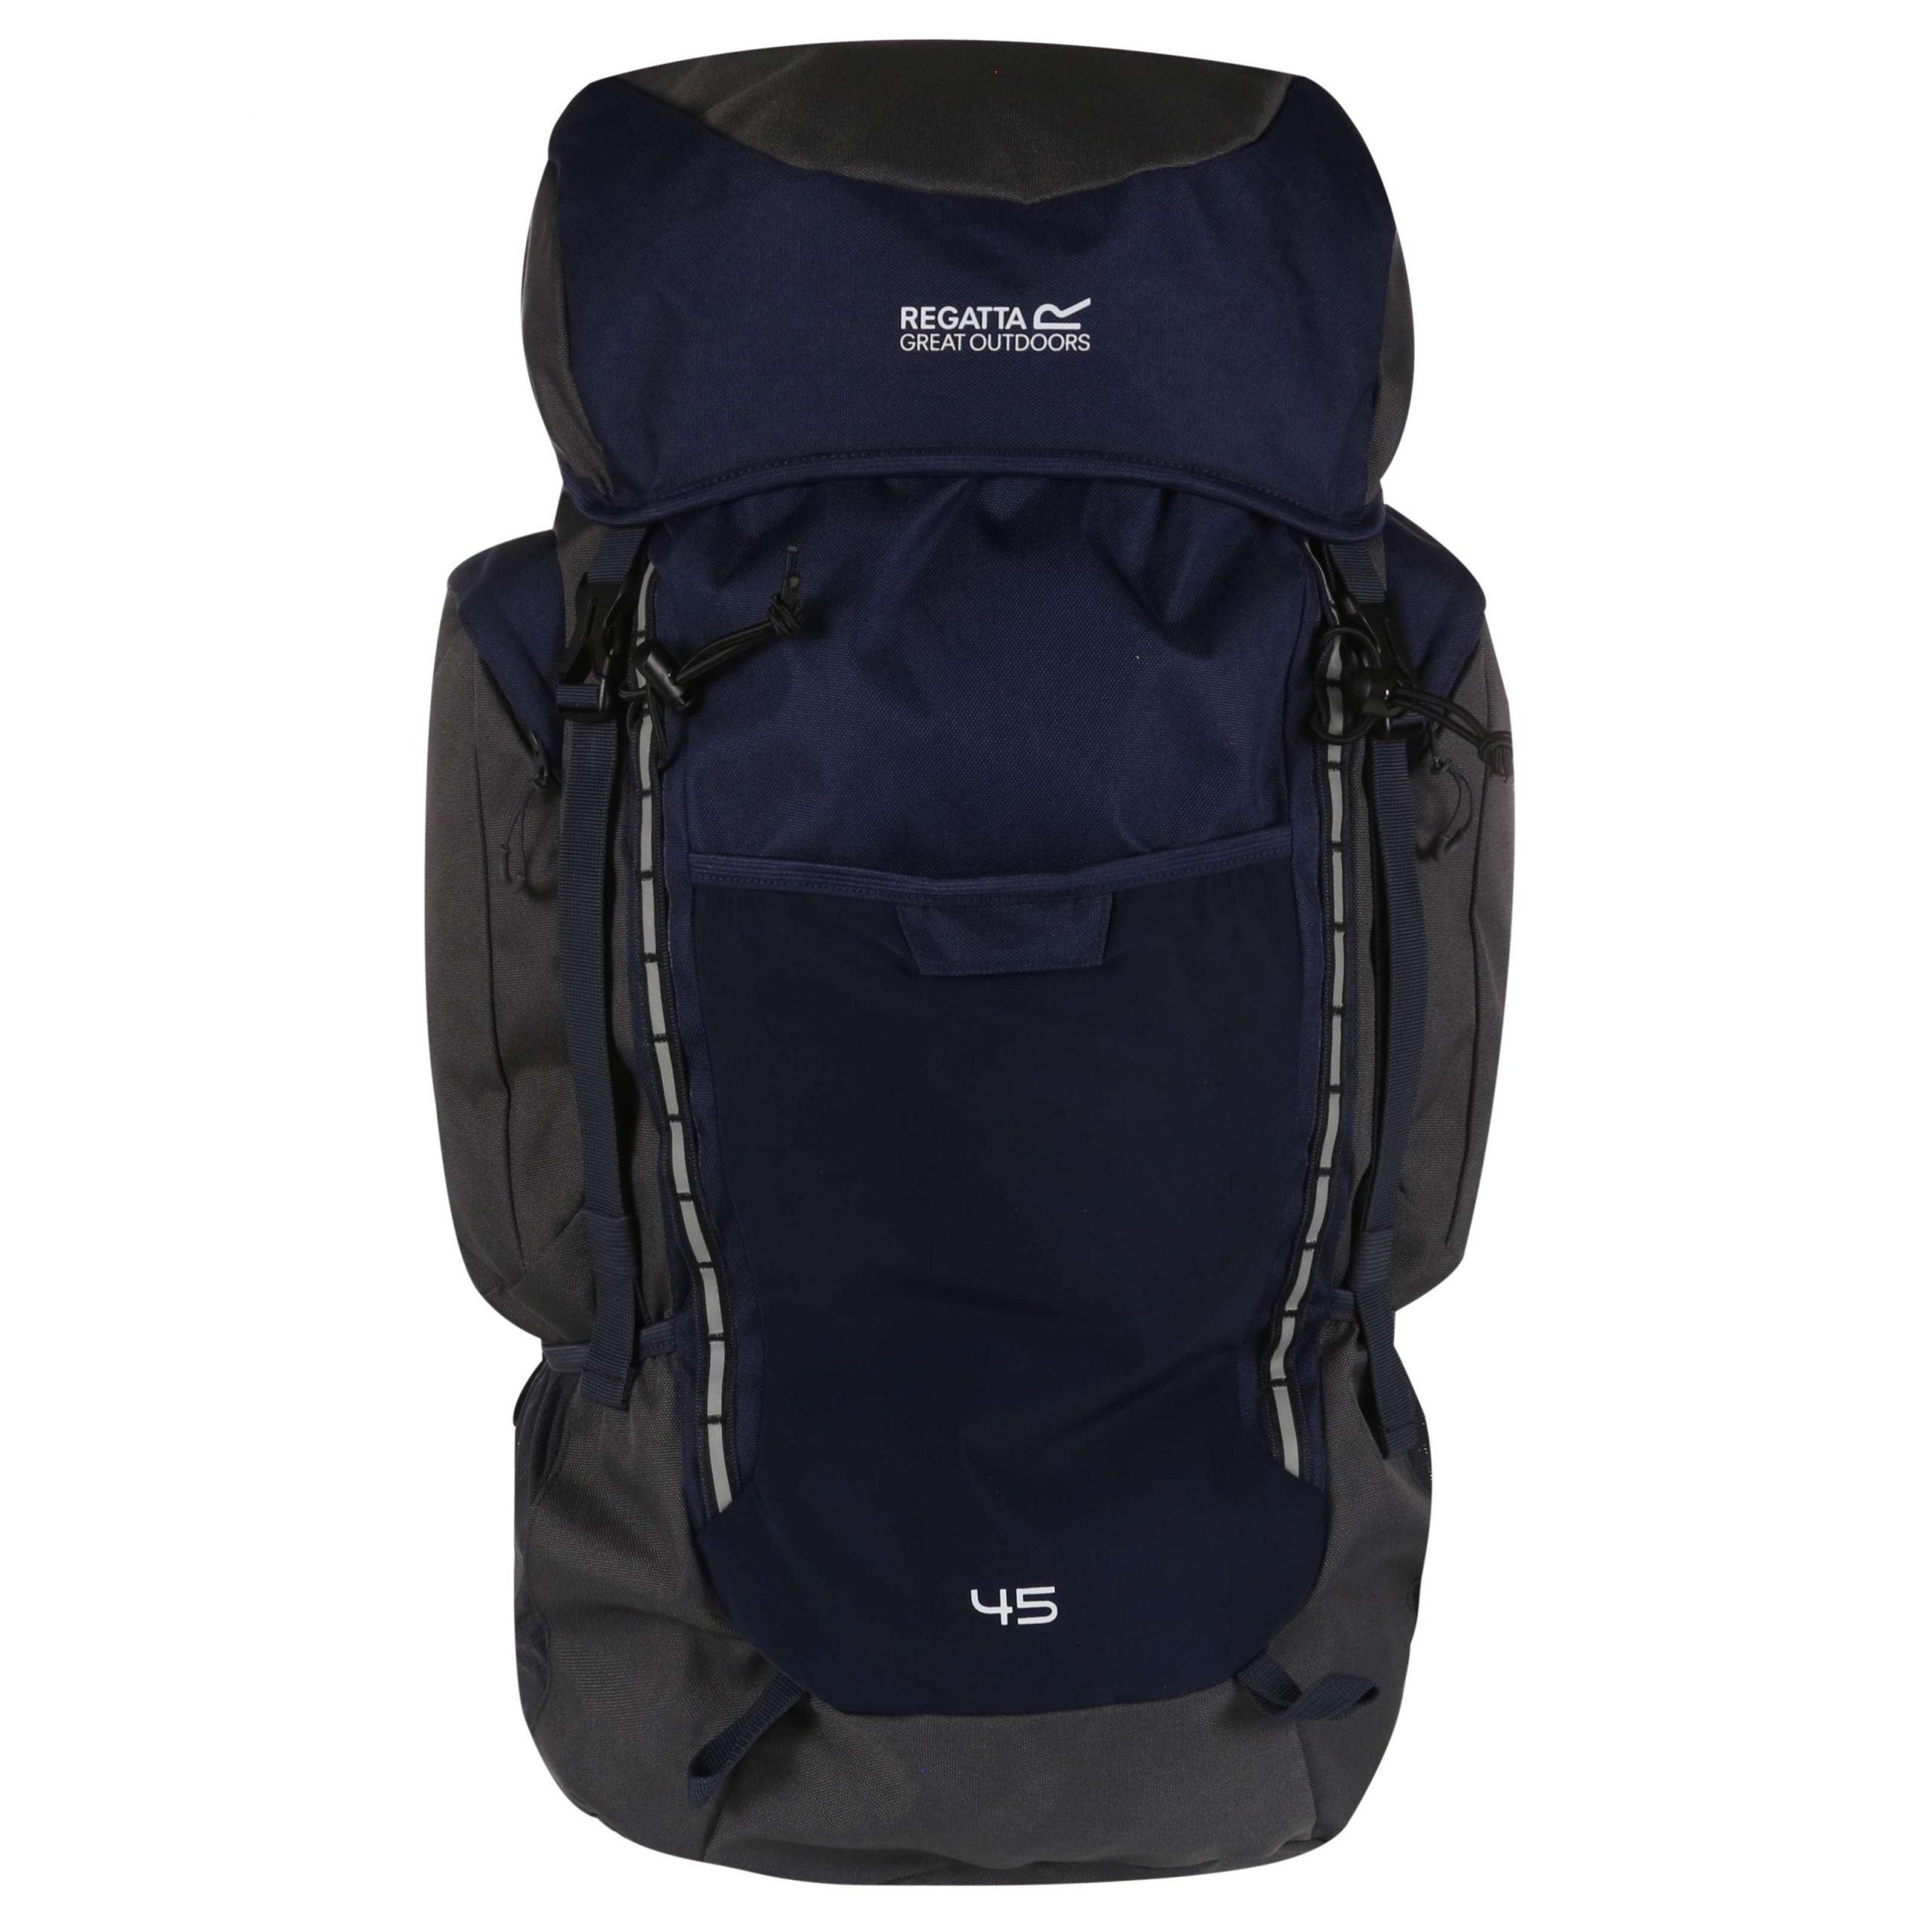 Luggage Straps Camping Trip Outdoor Equipment Polyester Bundling Belt